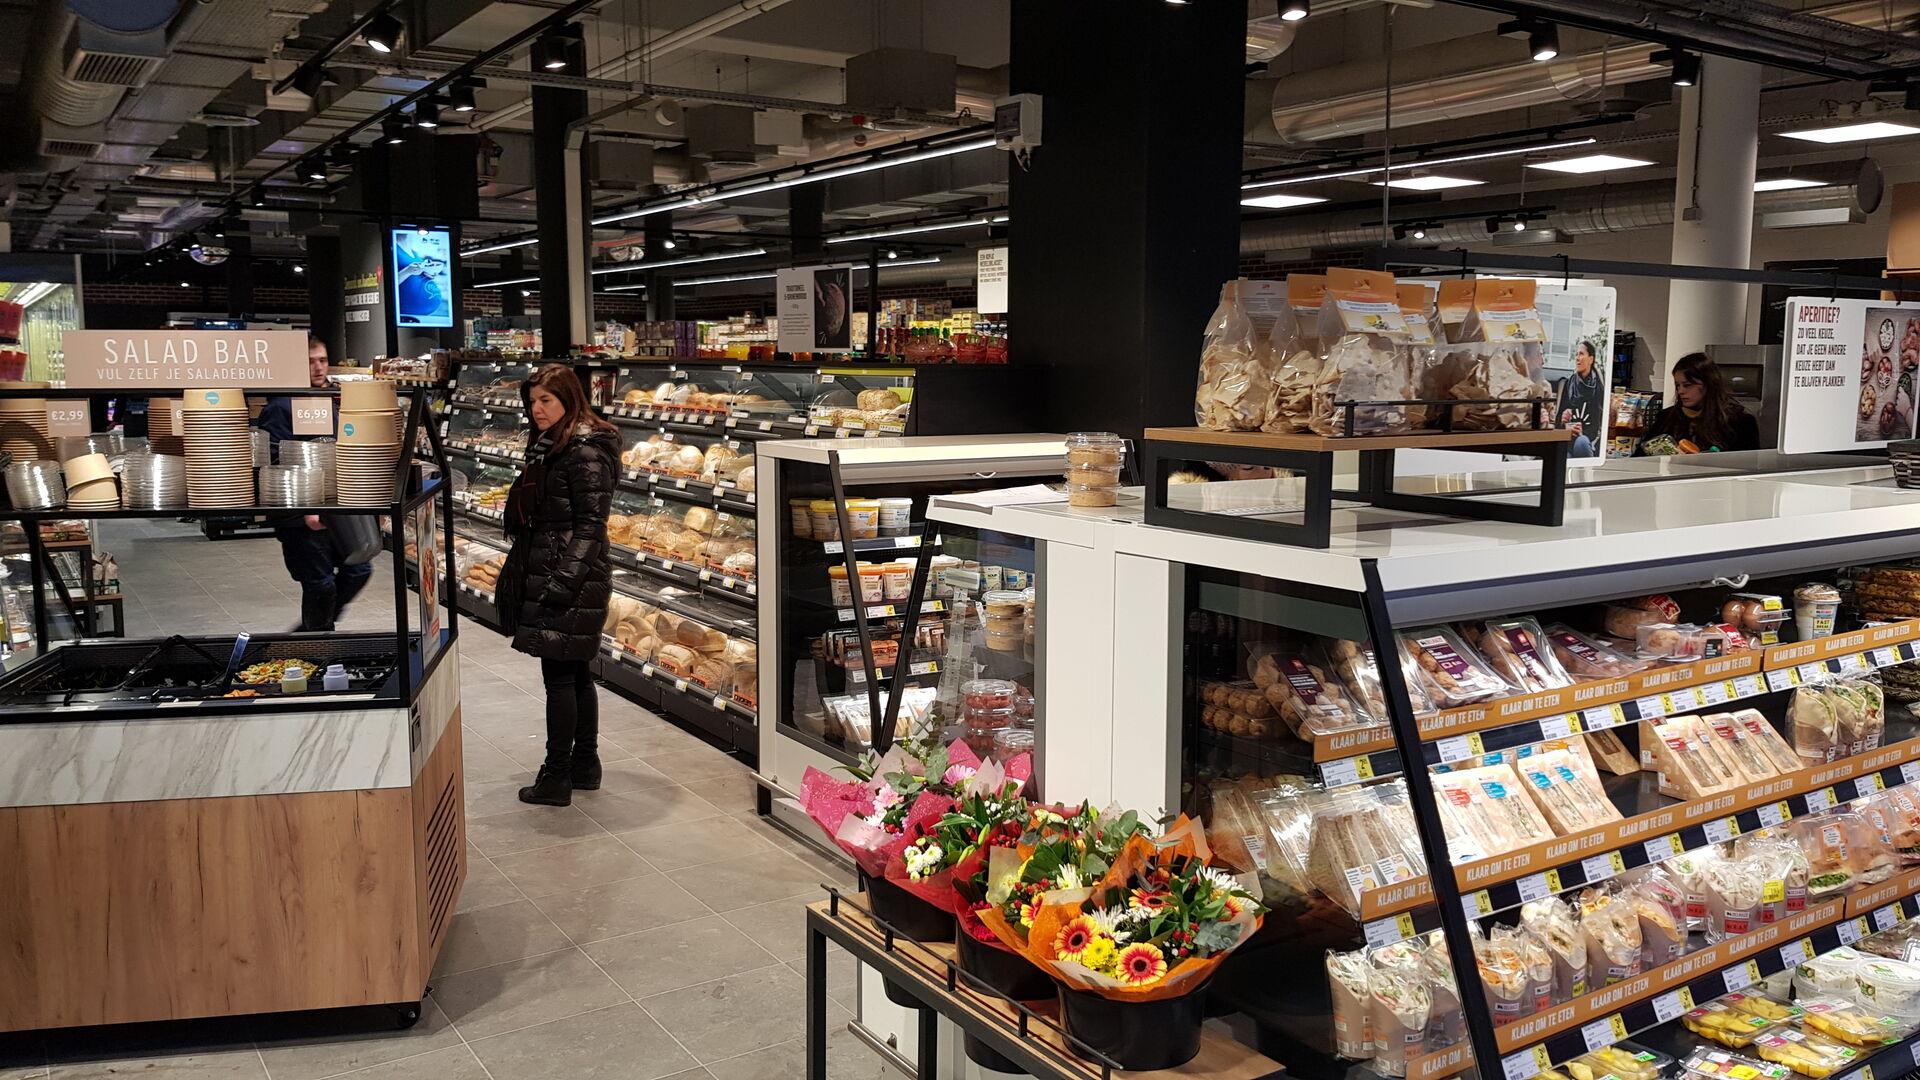 24 replies on Dating in supermarkt